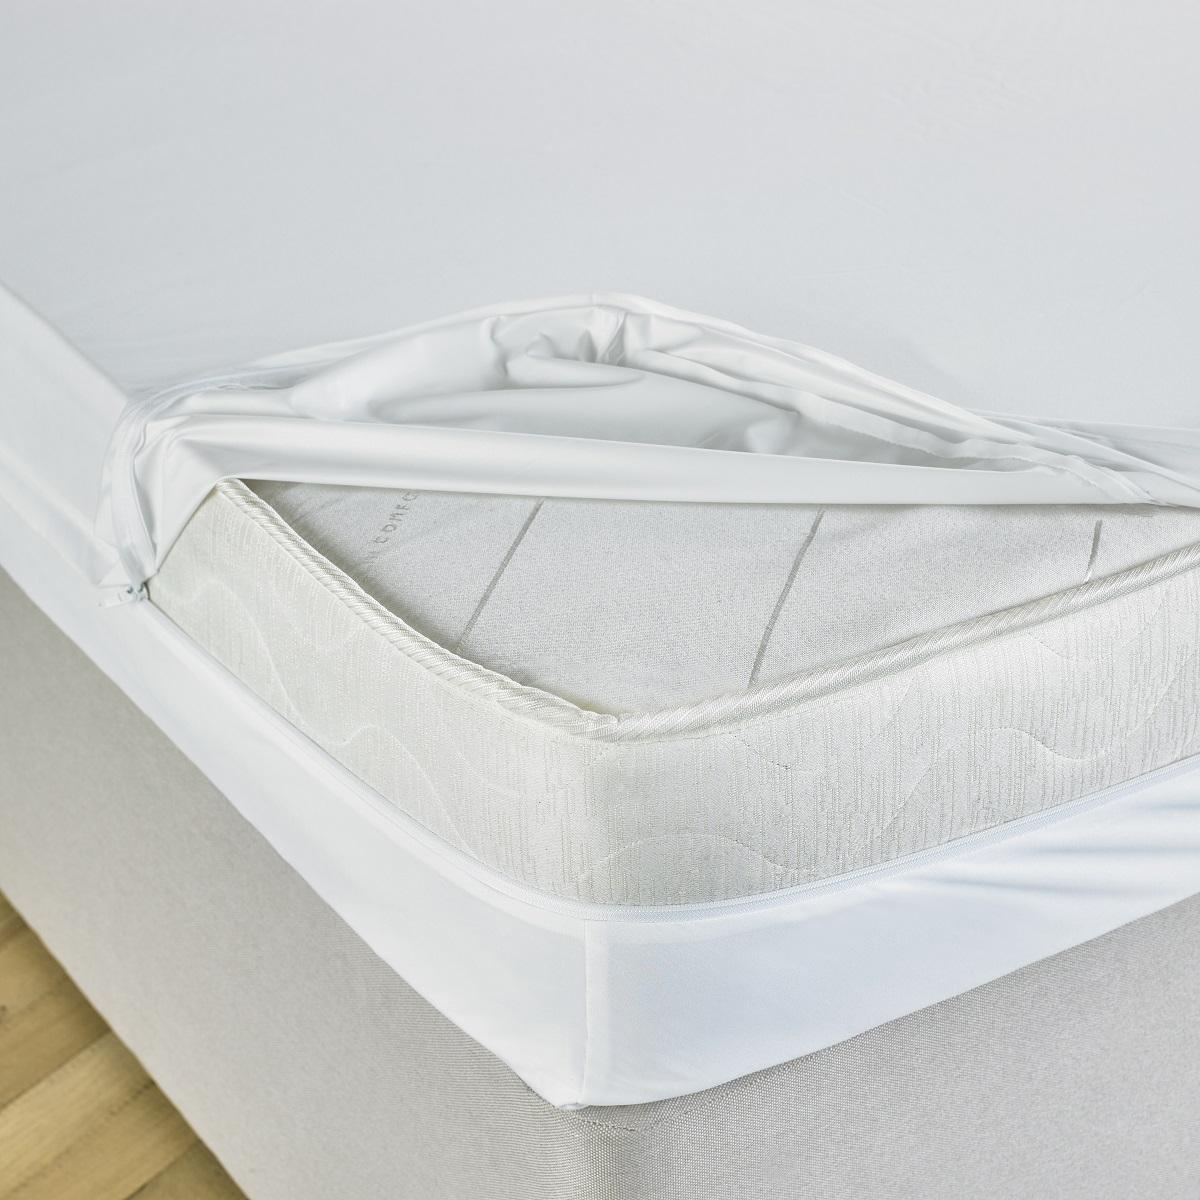 Antibacterial Mattress Encasement